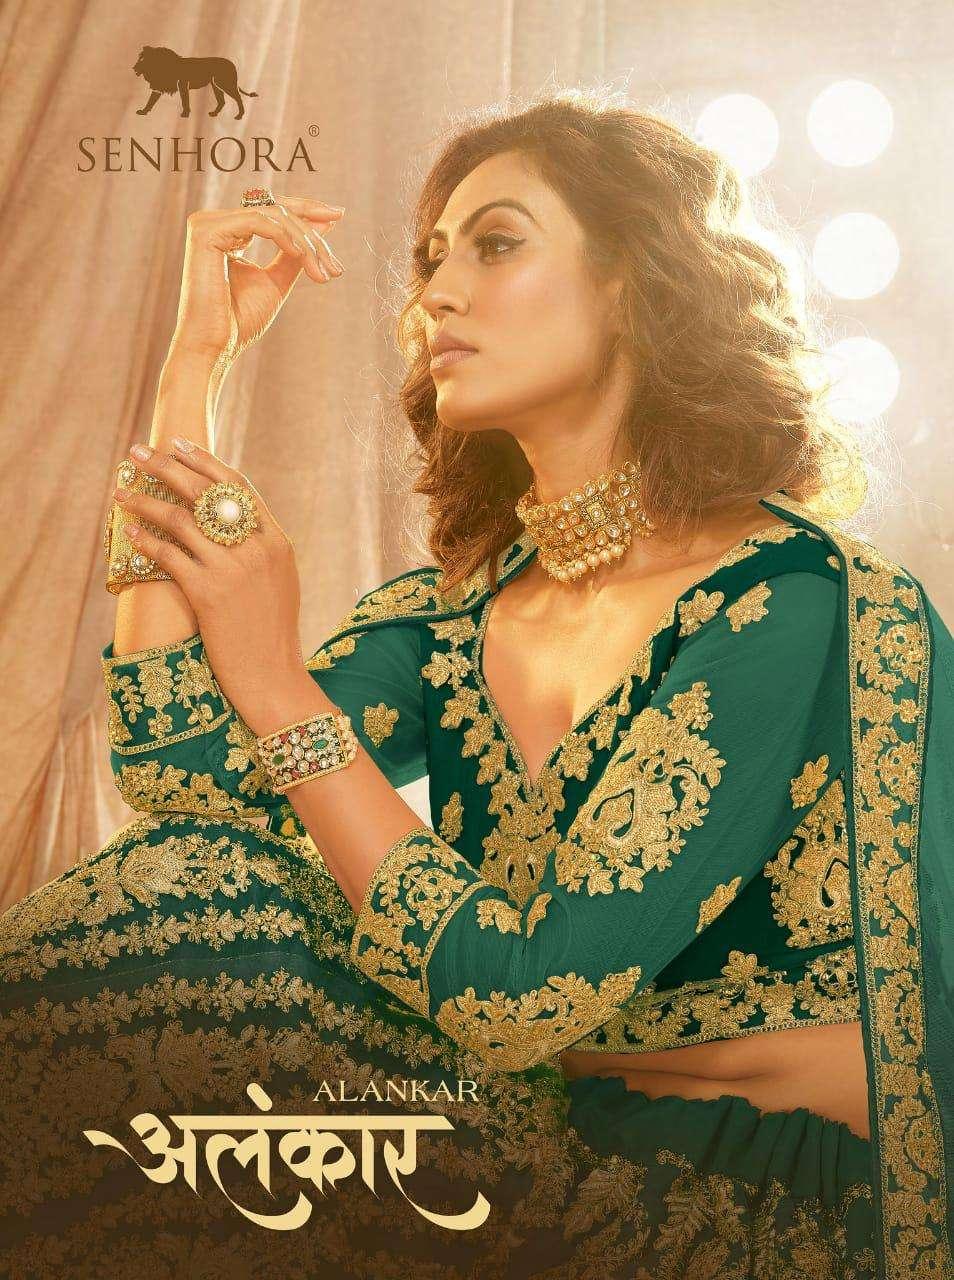 Senhora Alankar Designer Bridal Wear Lehenga Choli Collection in Wholesale Price